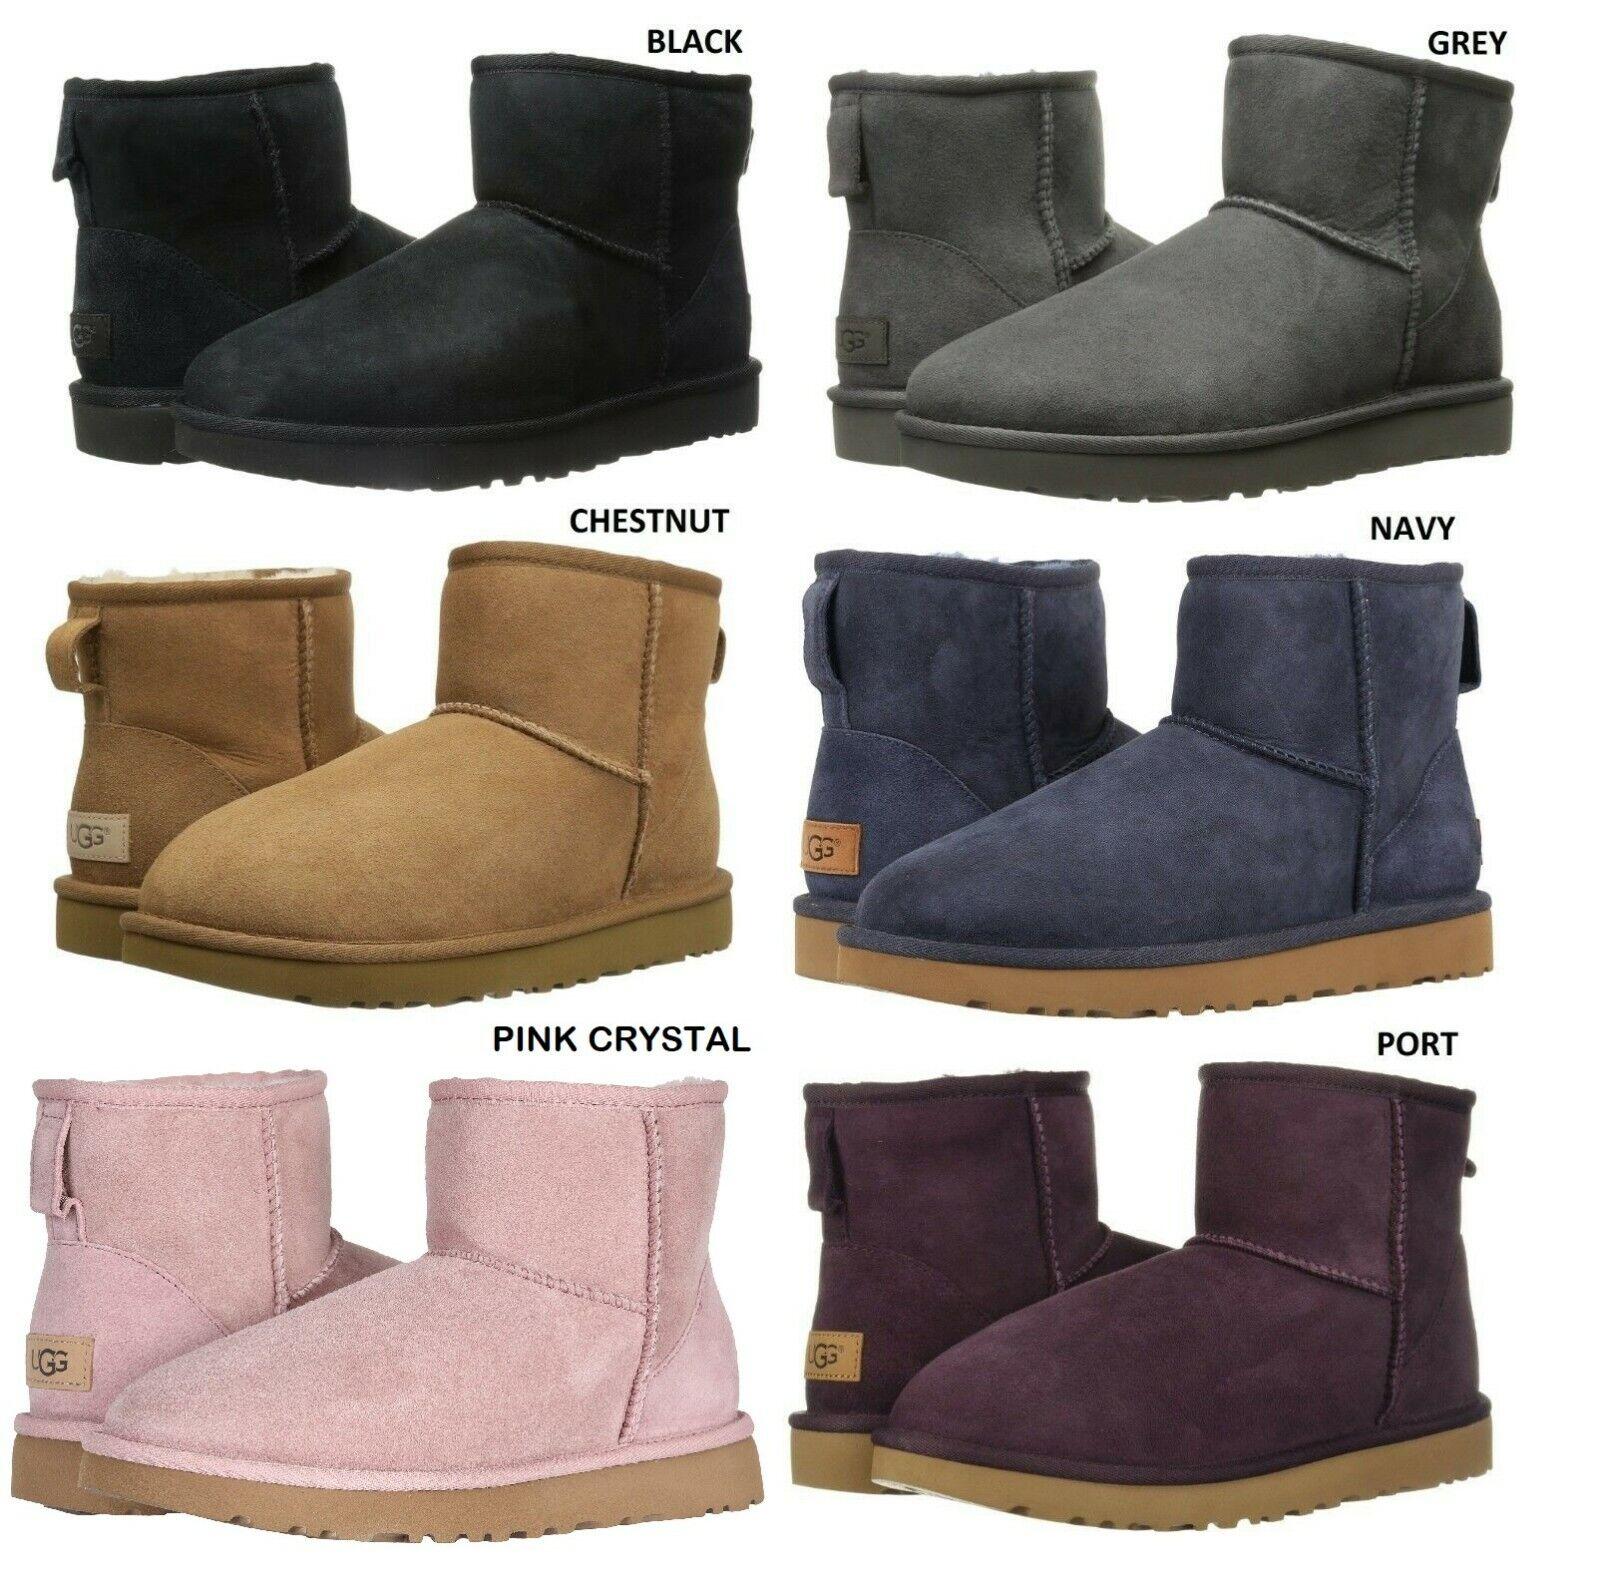 NEW UGG Women's Classic Mini II Winter Boots Shoes Black Che